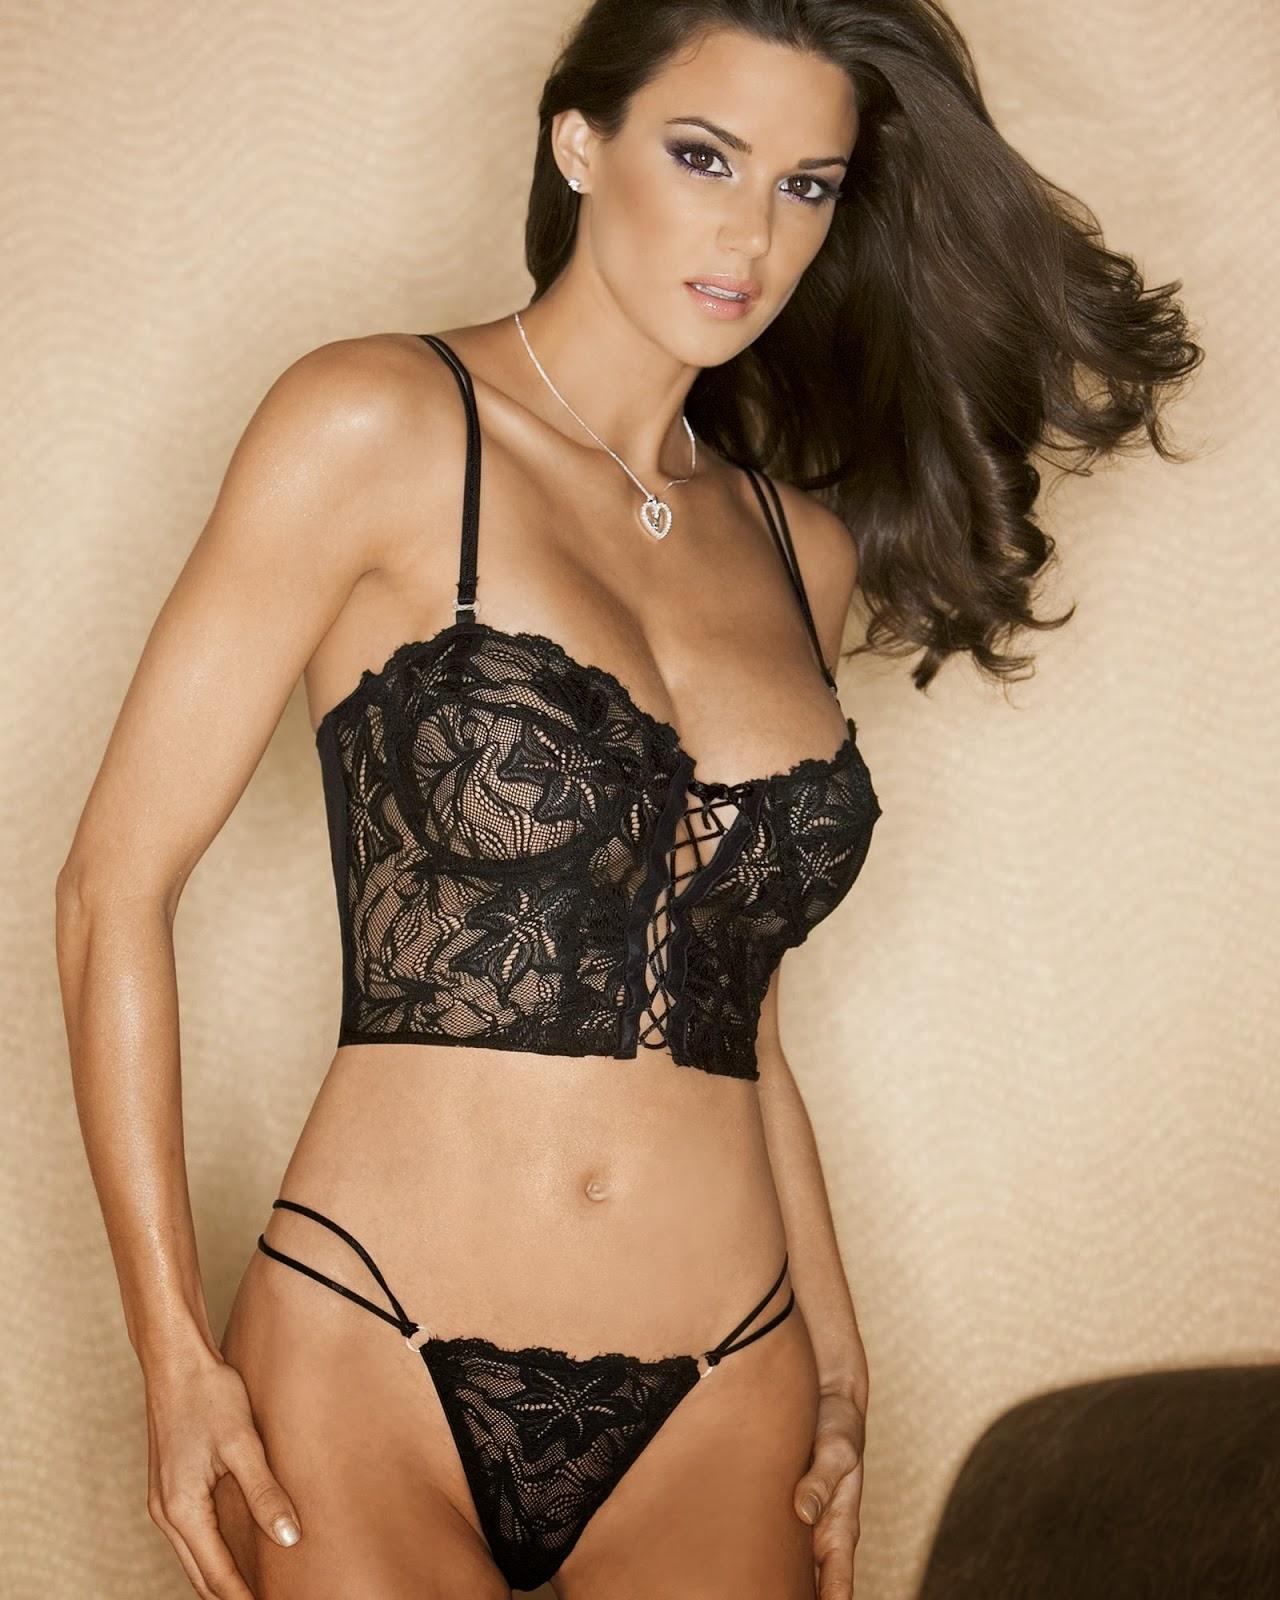 Nudeclub18 Tiffany Taylor Hot Playboy Snapsvol3-2008